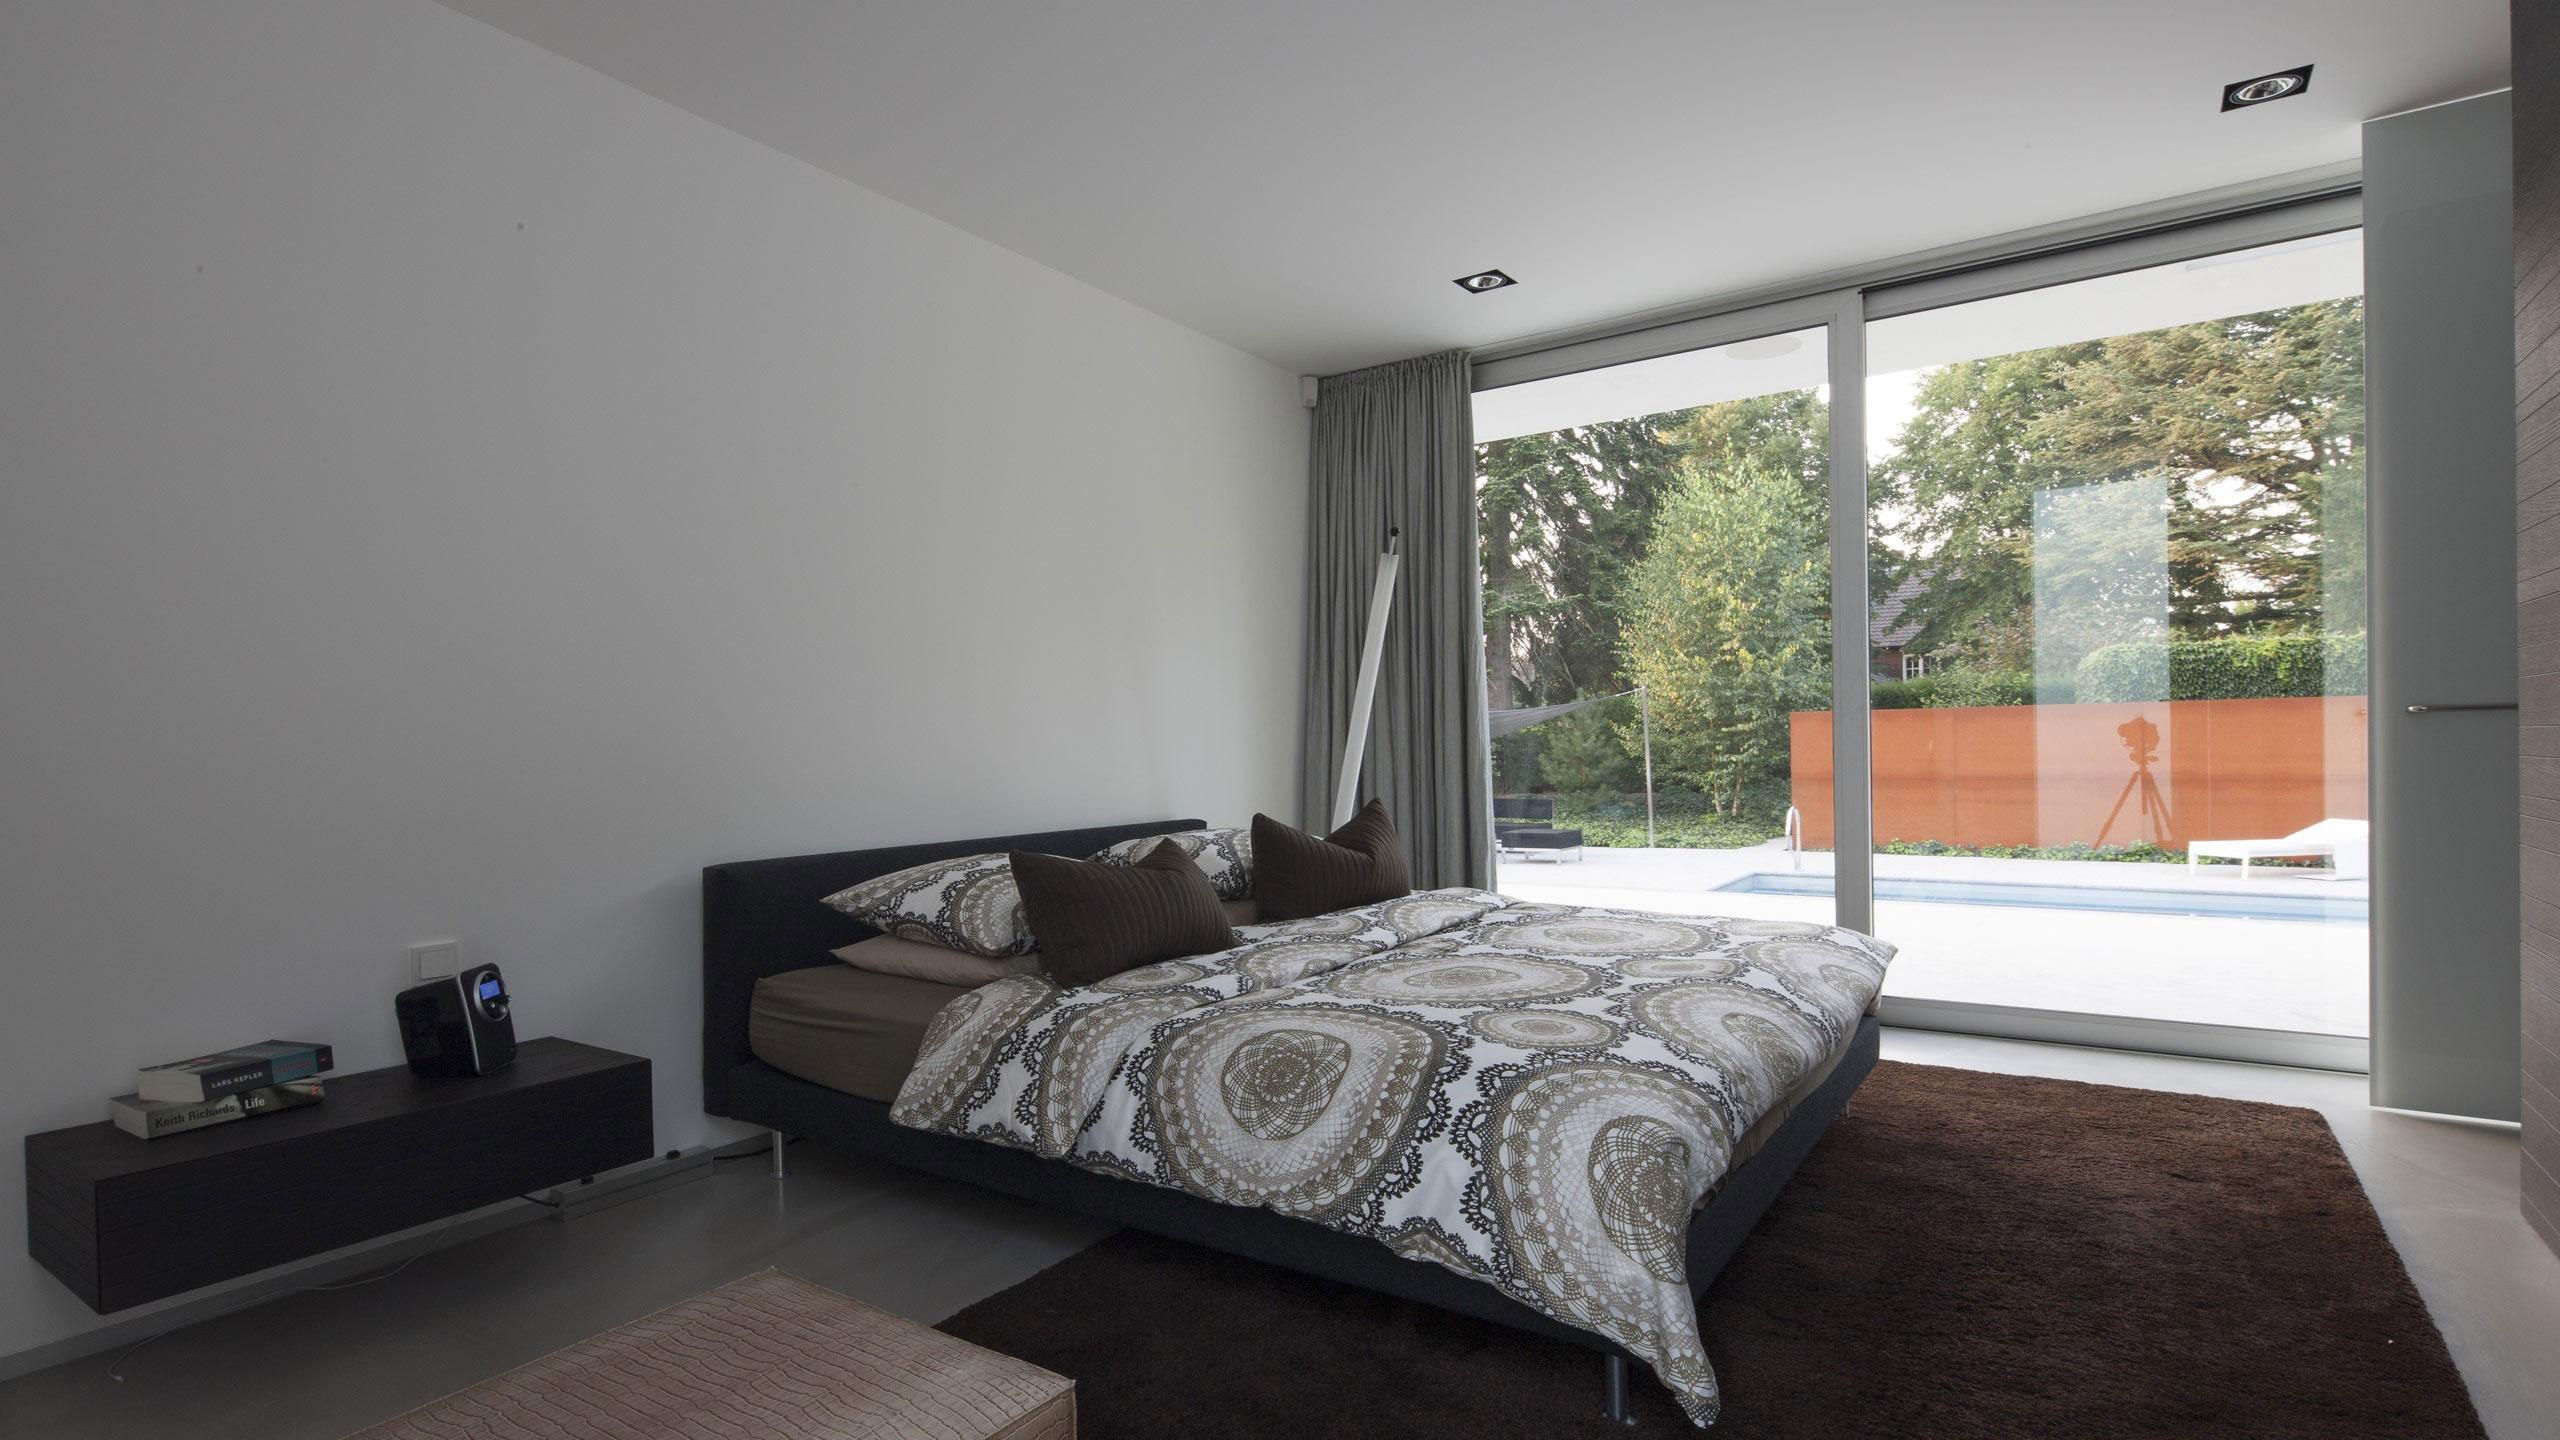 Boxed Villa Spee Haelen with Panoramic Windows by Lab32 architecten-22